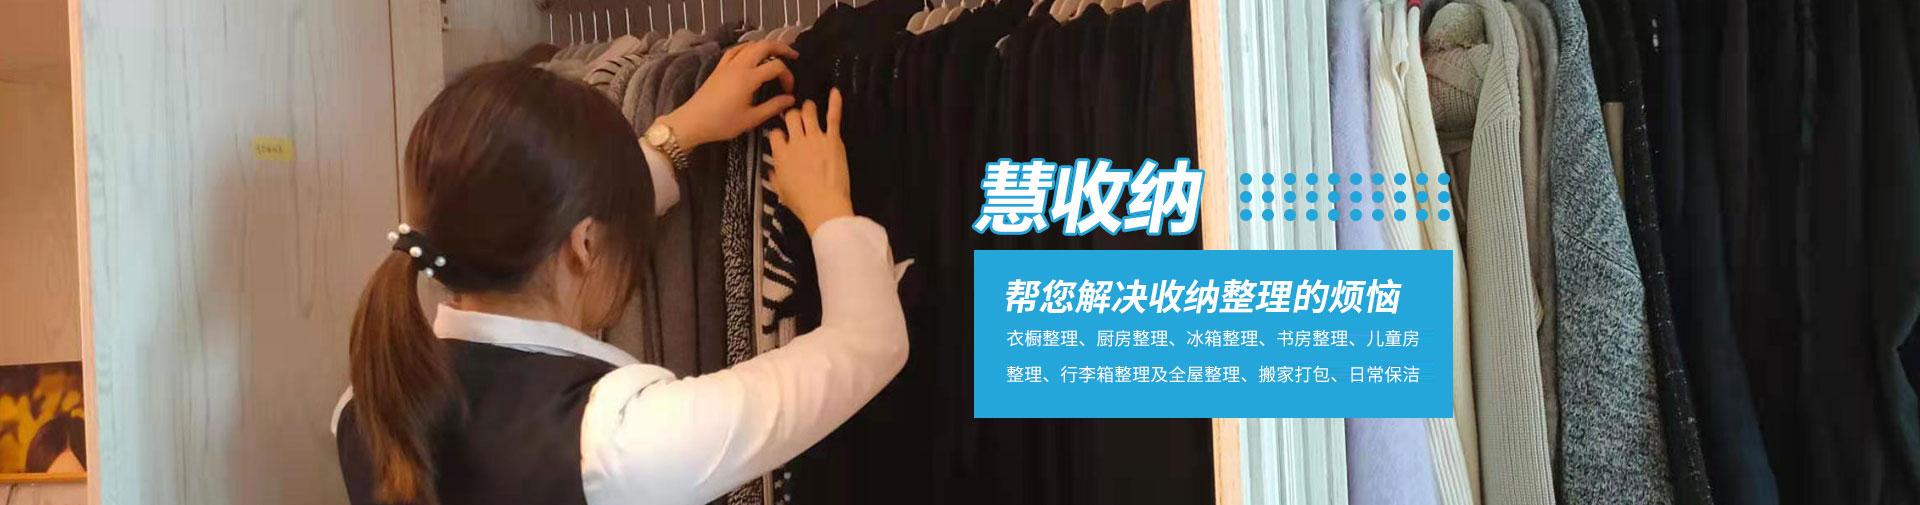 http://www.cqqiaofuren.com/data/upload/202103/20210315171215_388.jpg